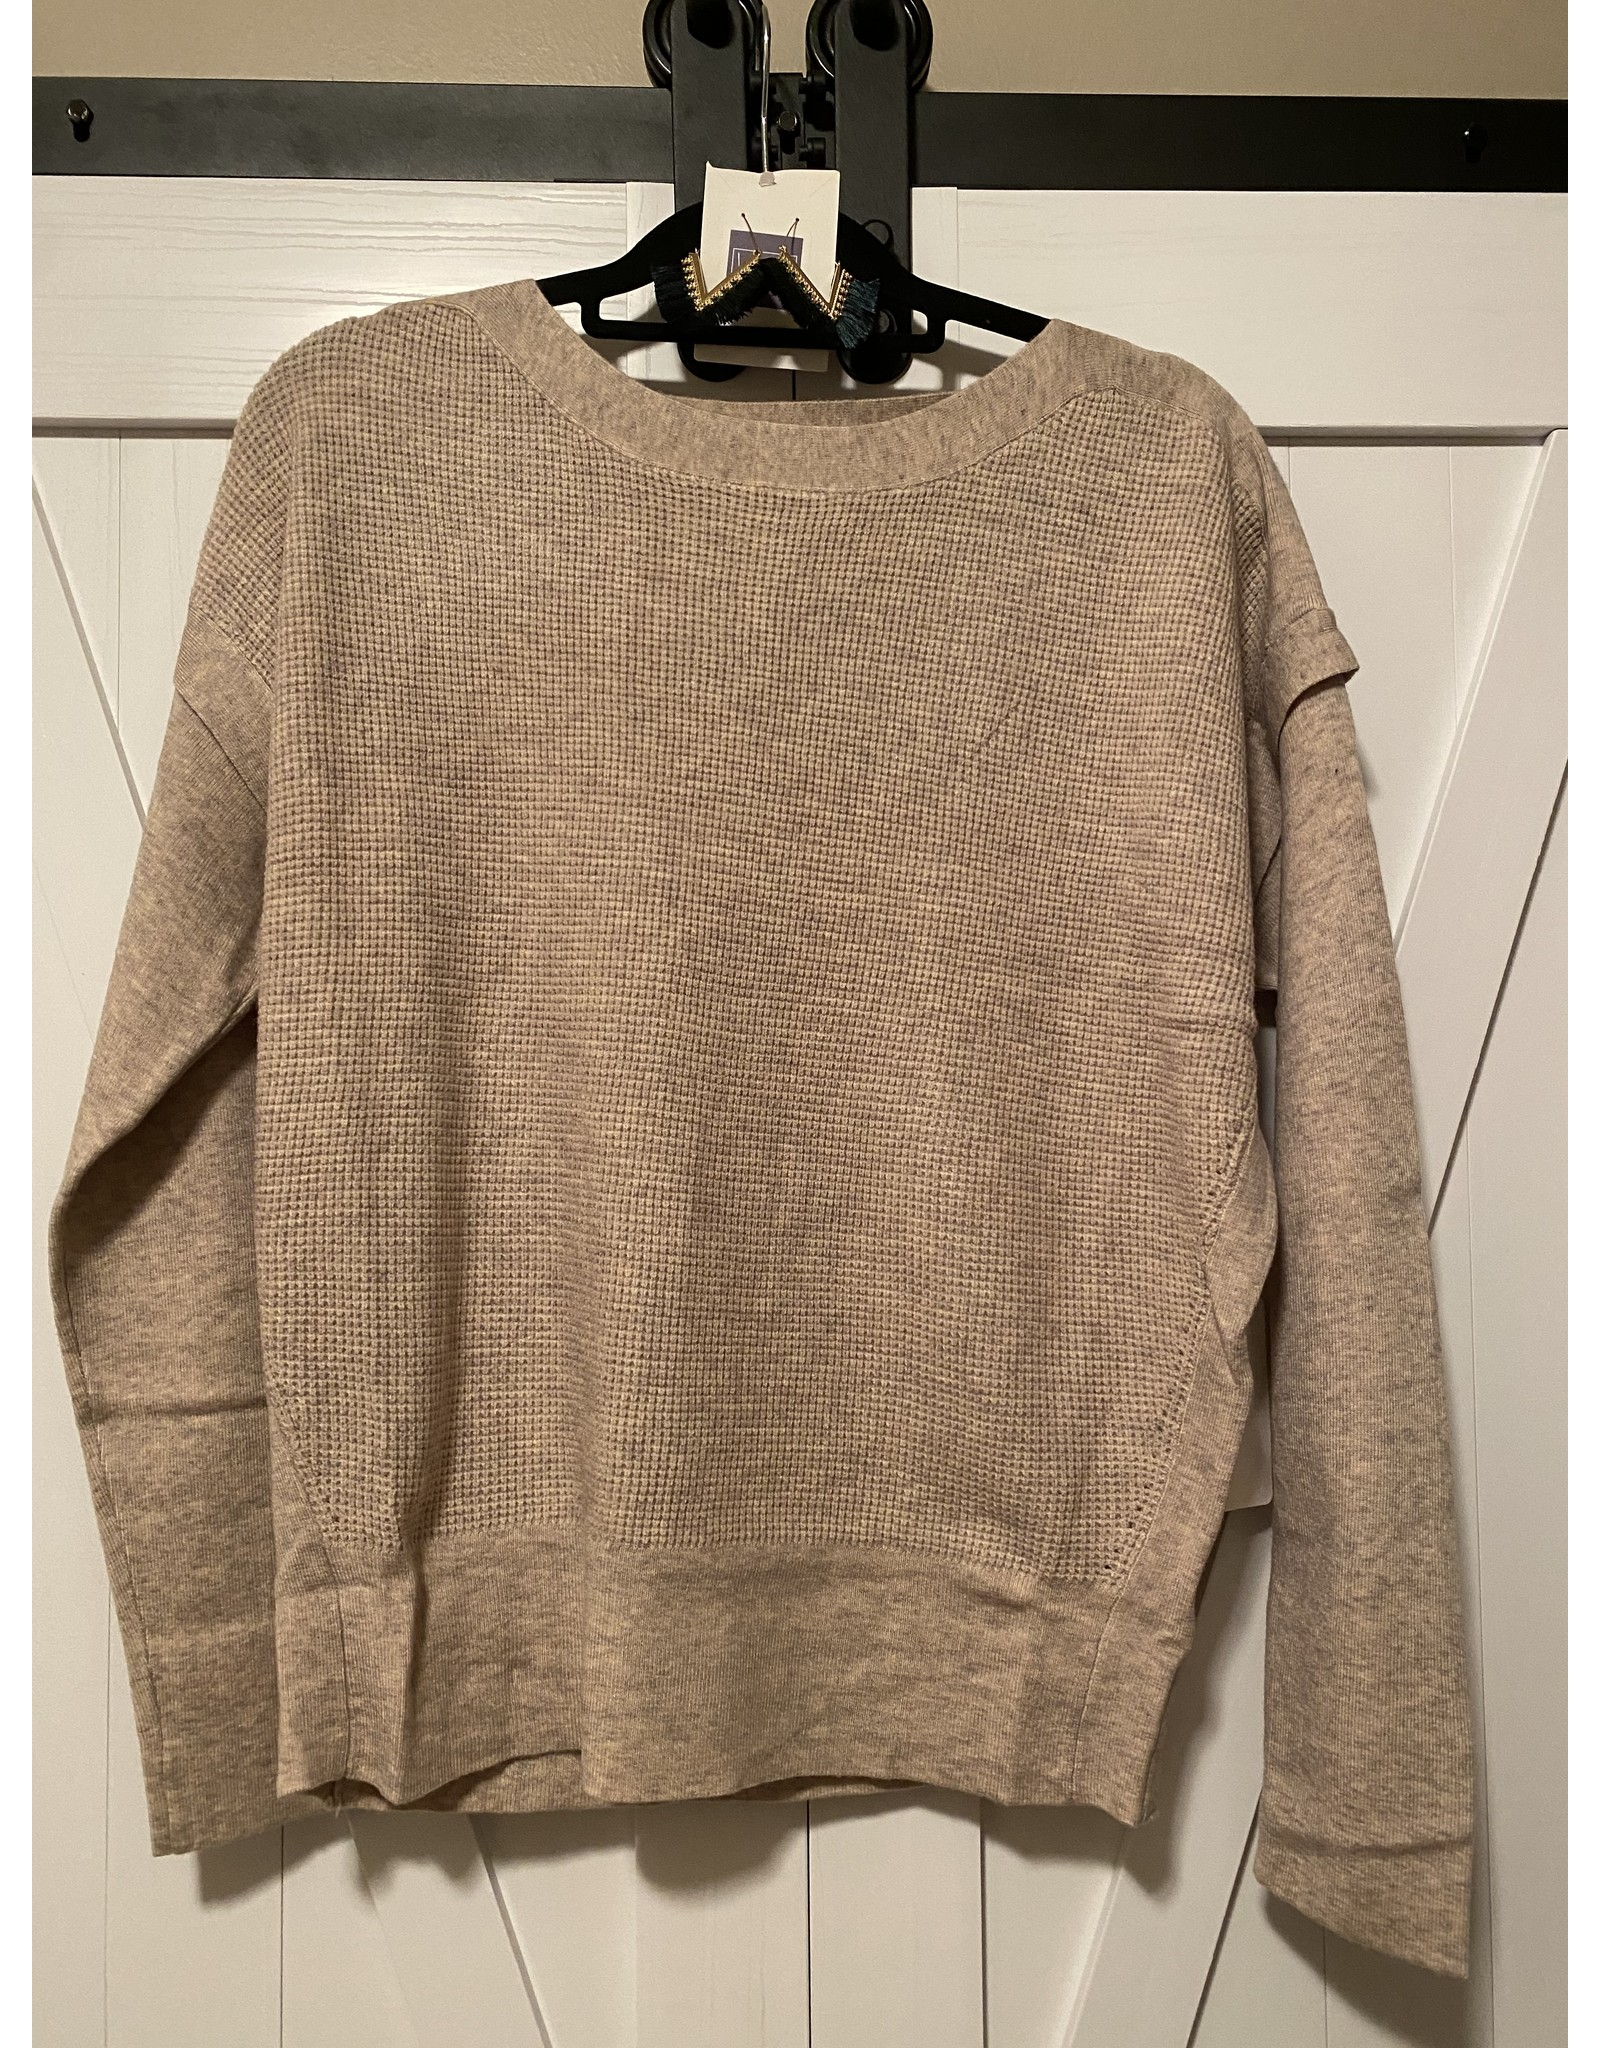 Fate Waffle knit drop shoulder sweater